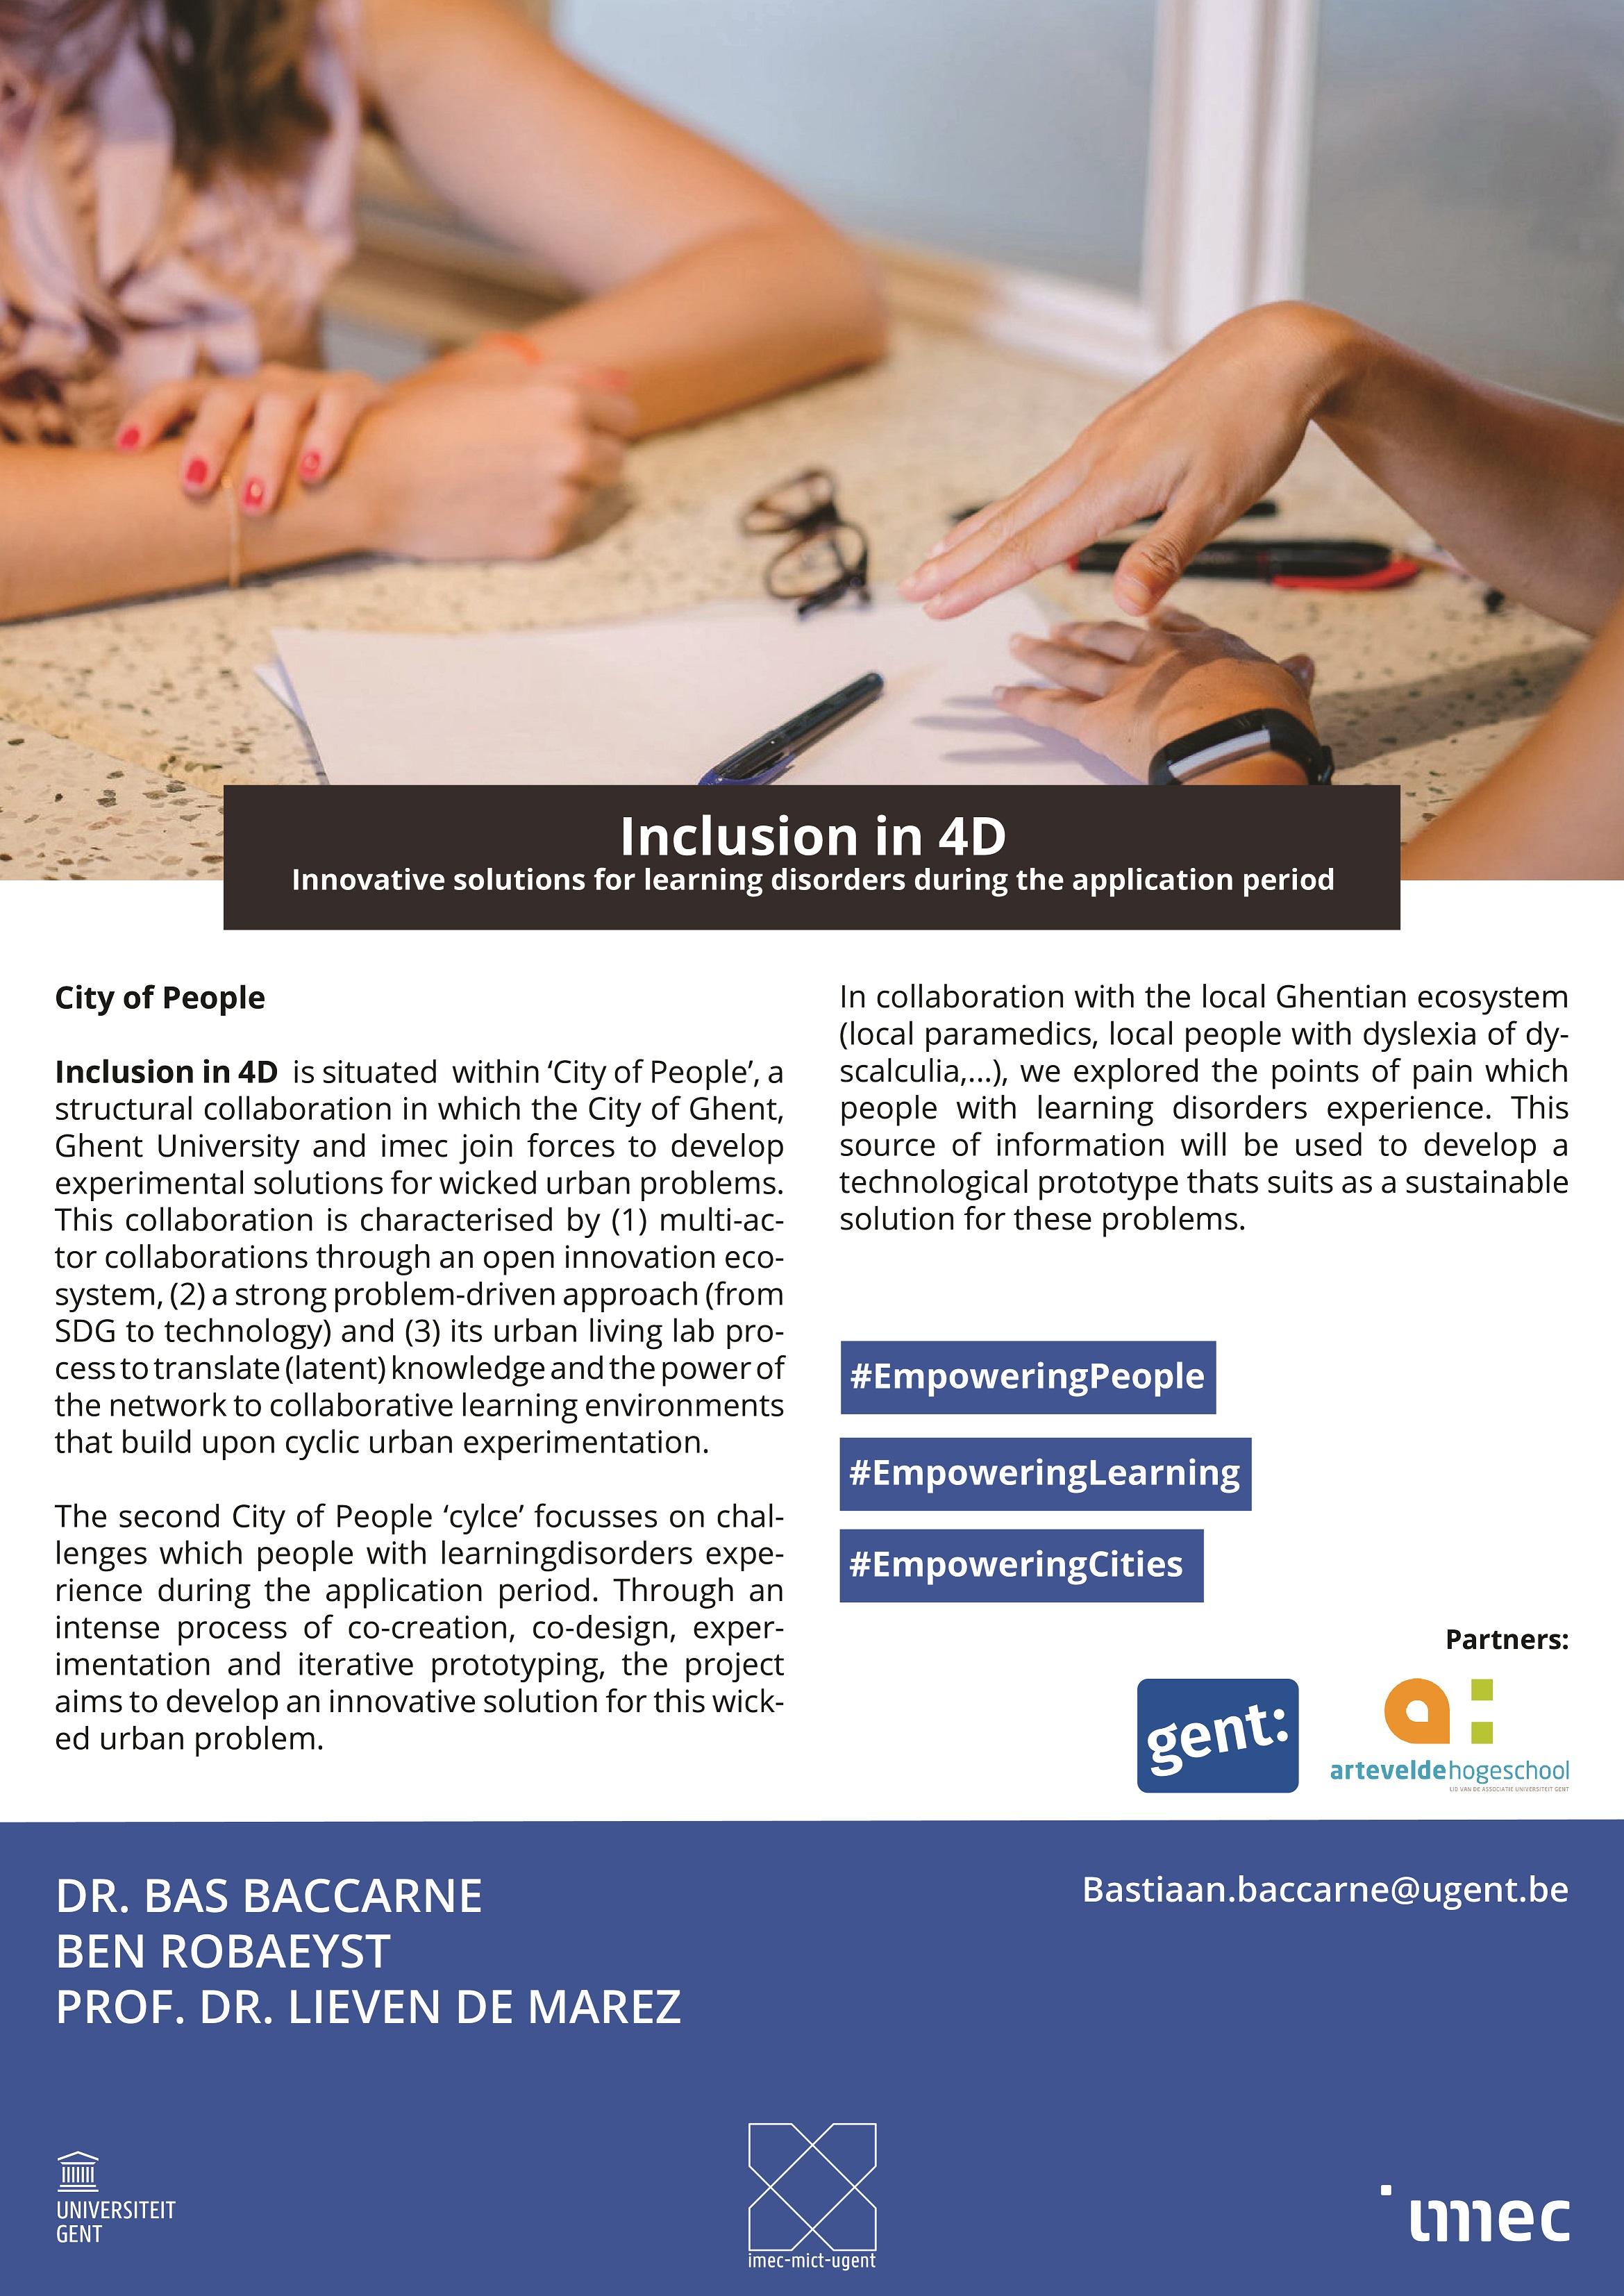 inclusion in 4D